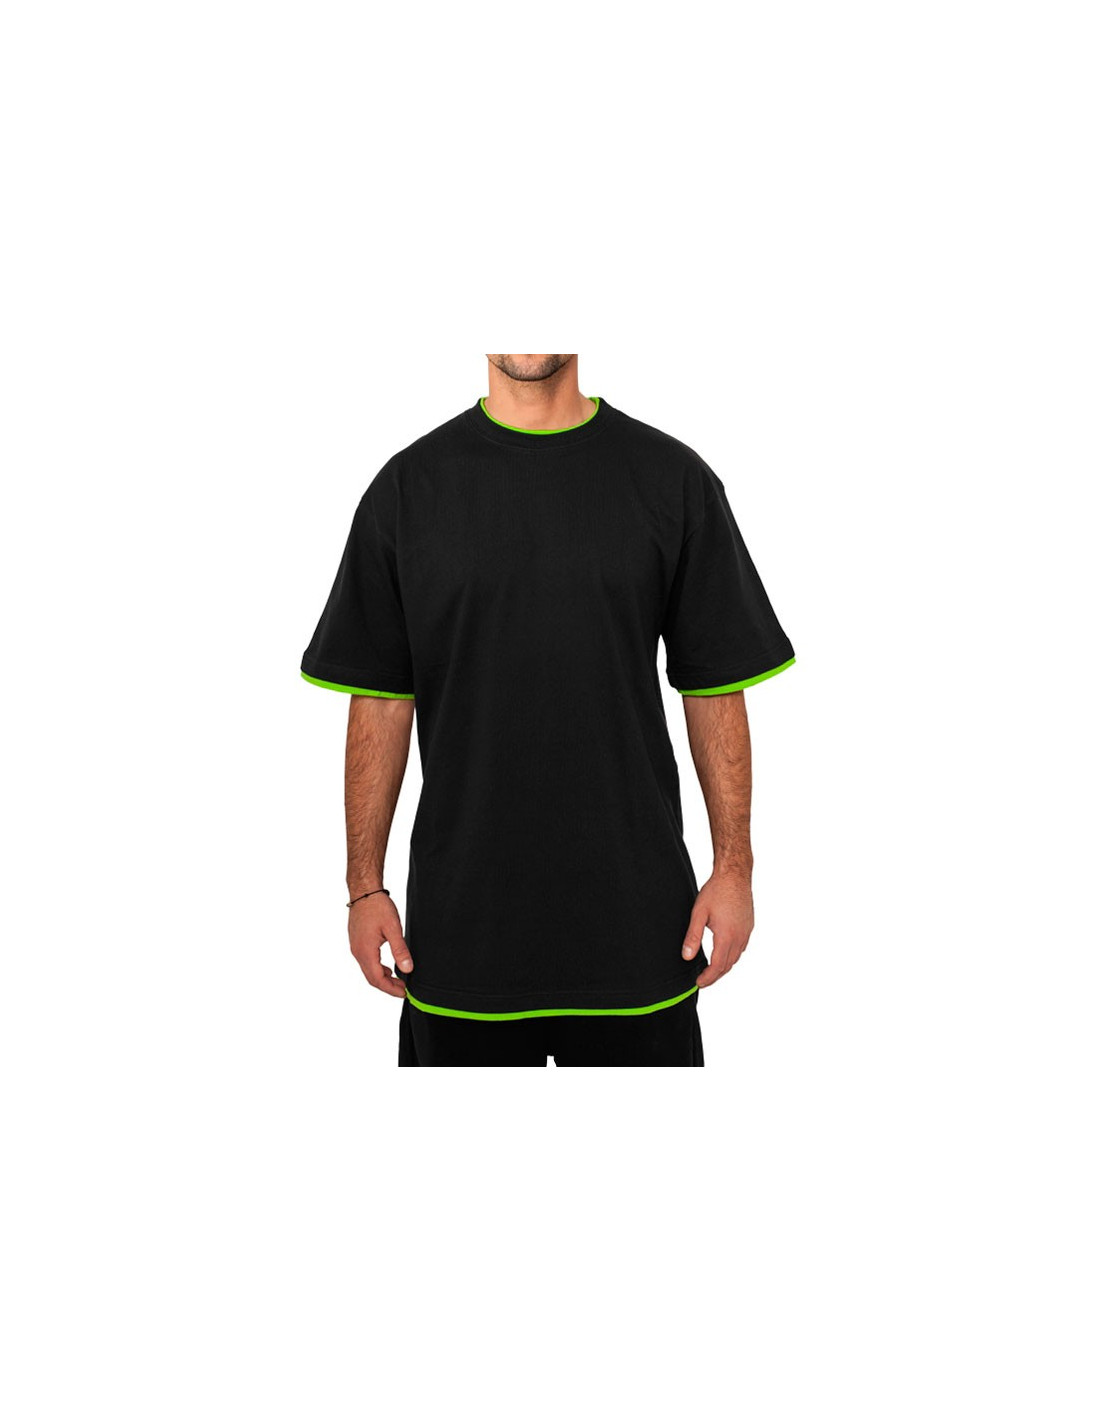 Urban 2-tone t-shirt black / lime green